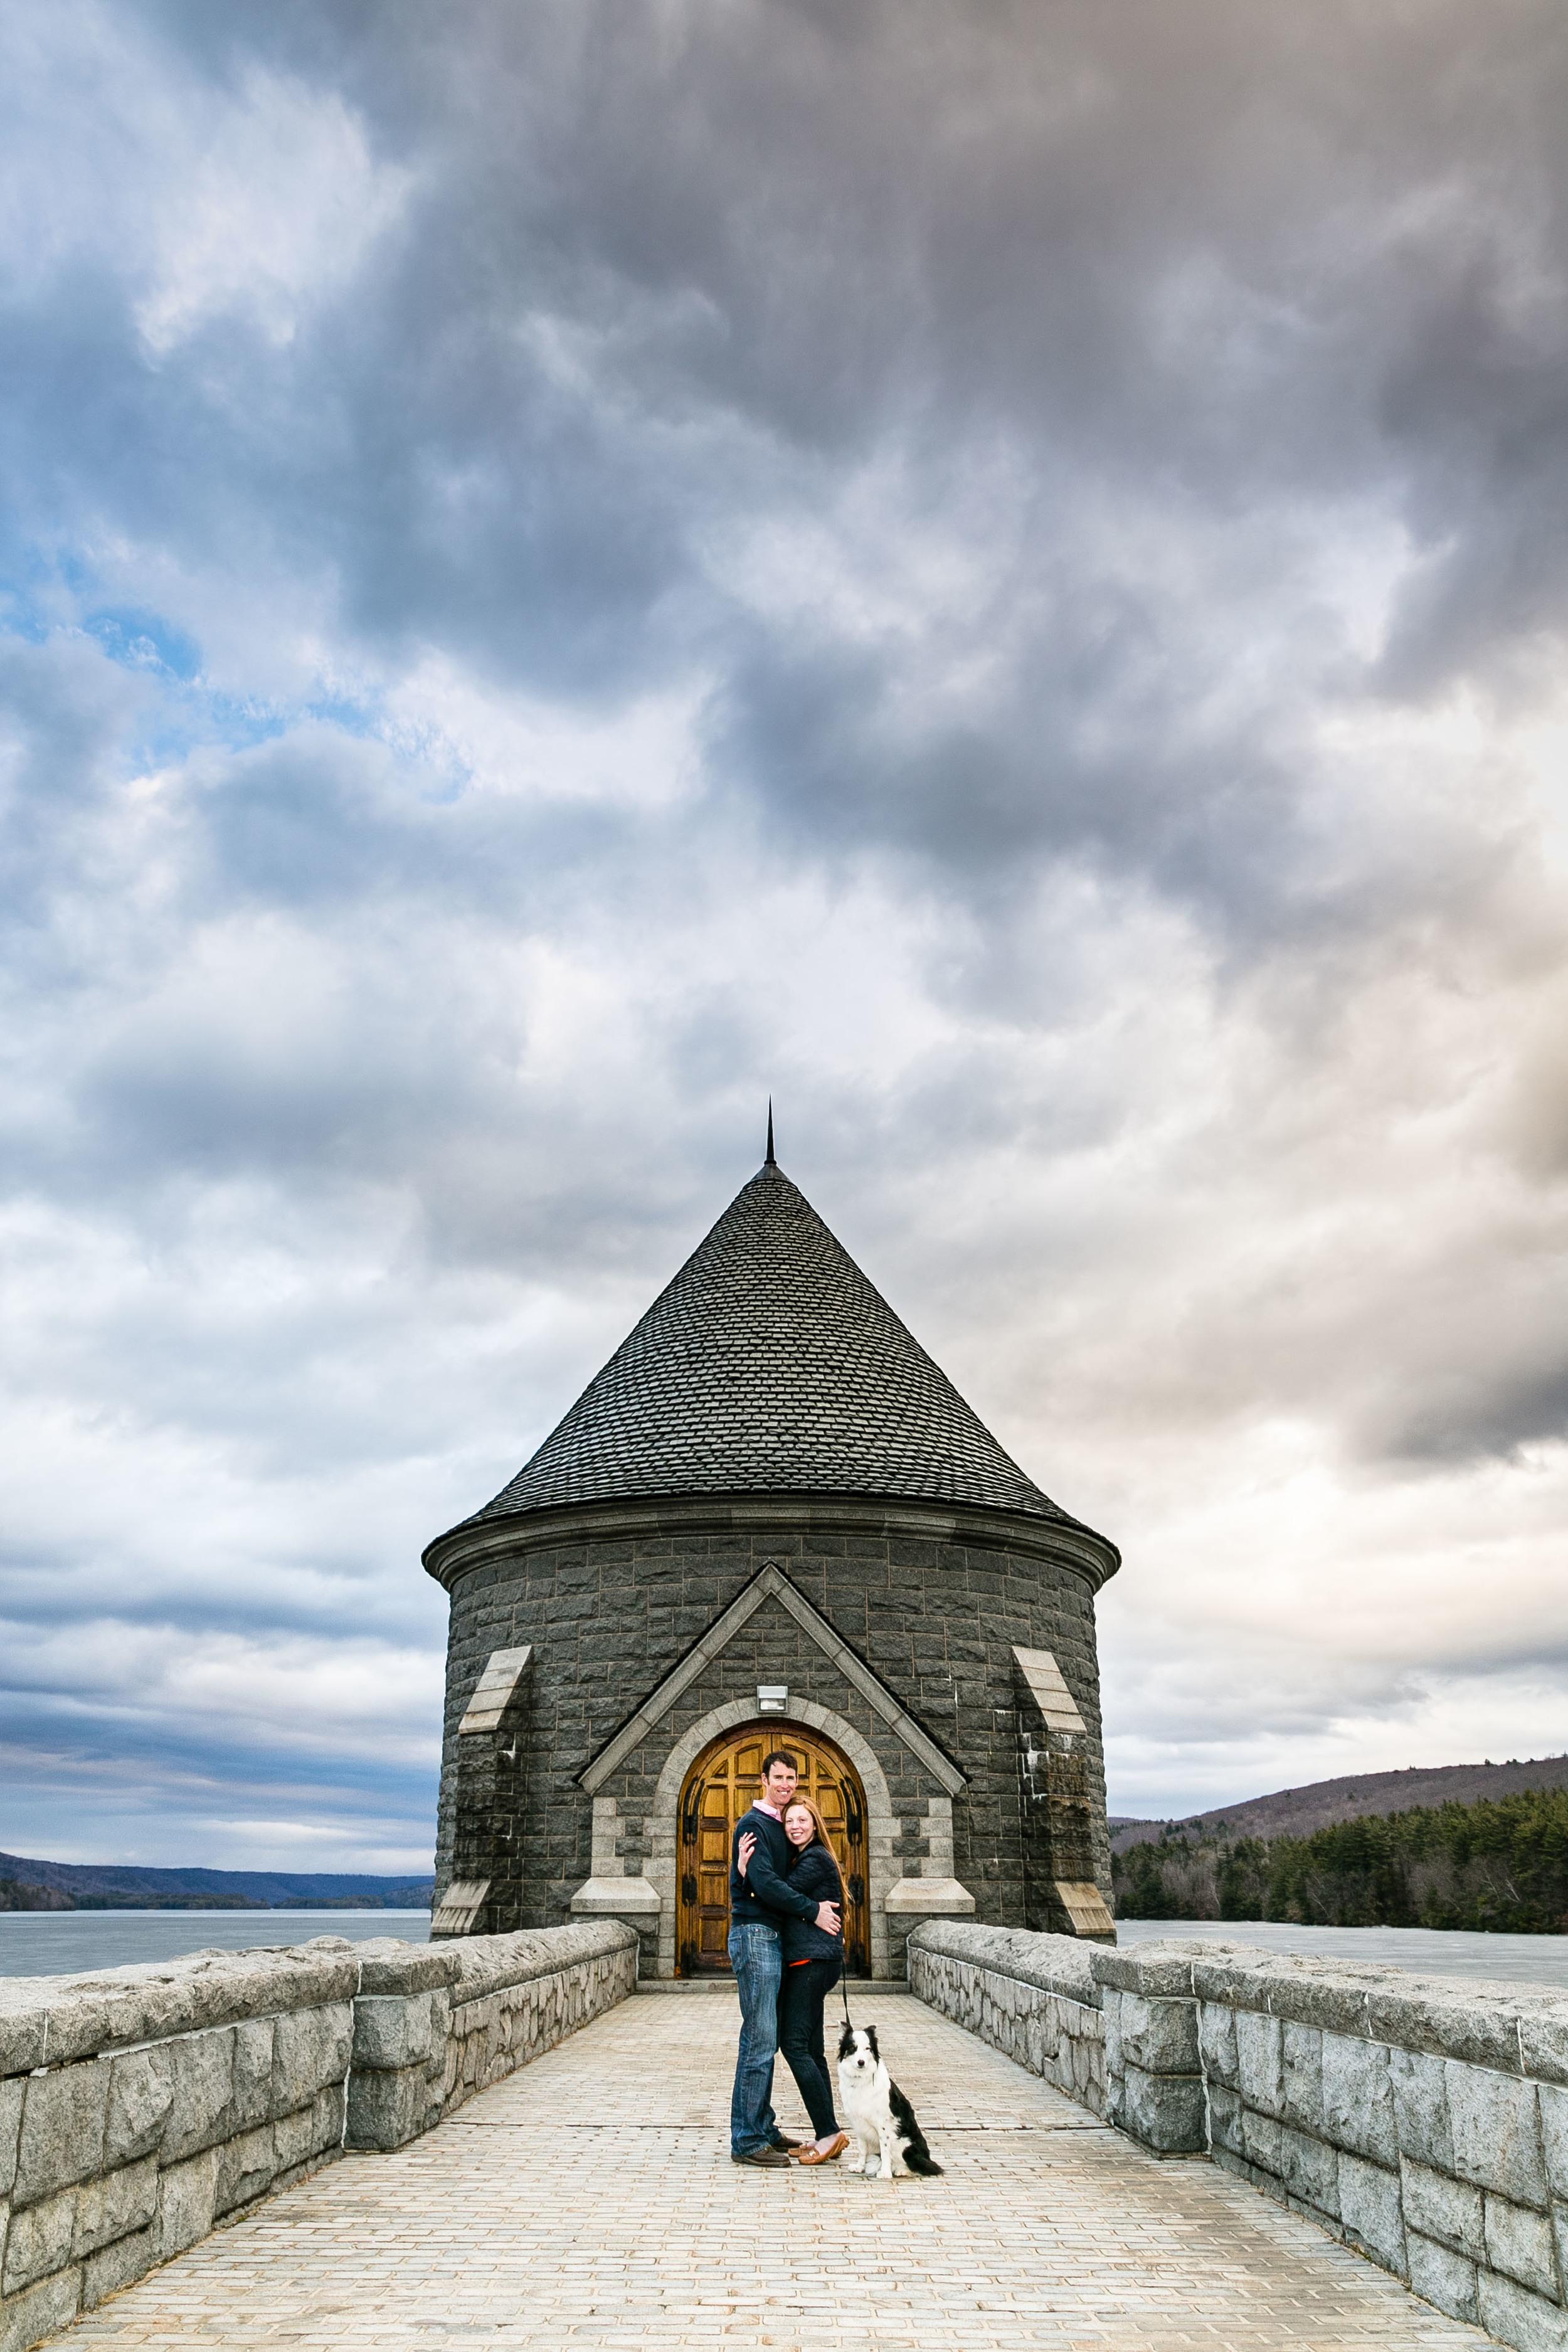 Romantic-Engagement-Poto-Session-Photography-by-Jacek-Dolata-CT-MA-RI-NJ-NYC-NY-VT-NH-PA-5.jpg